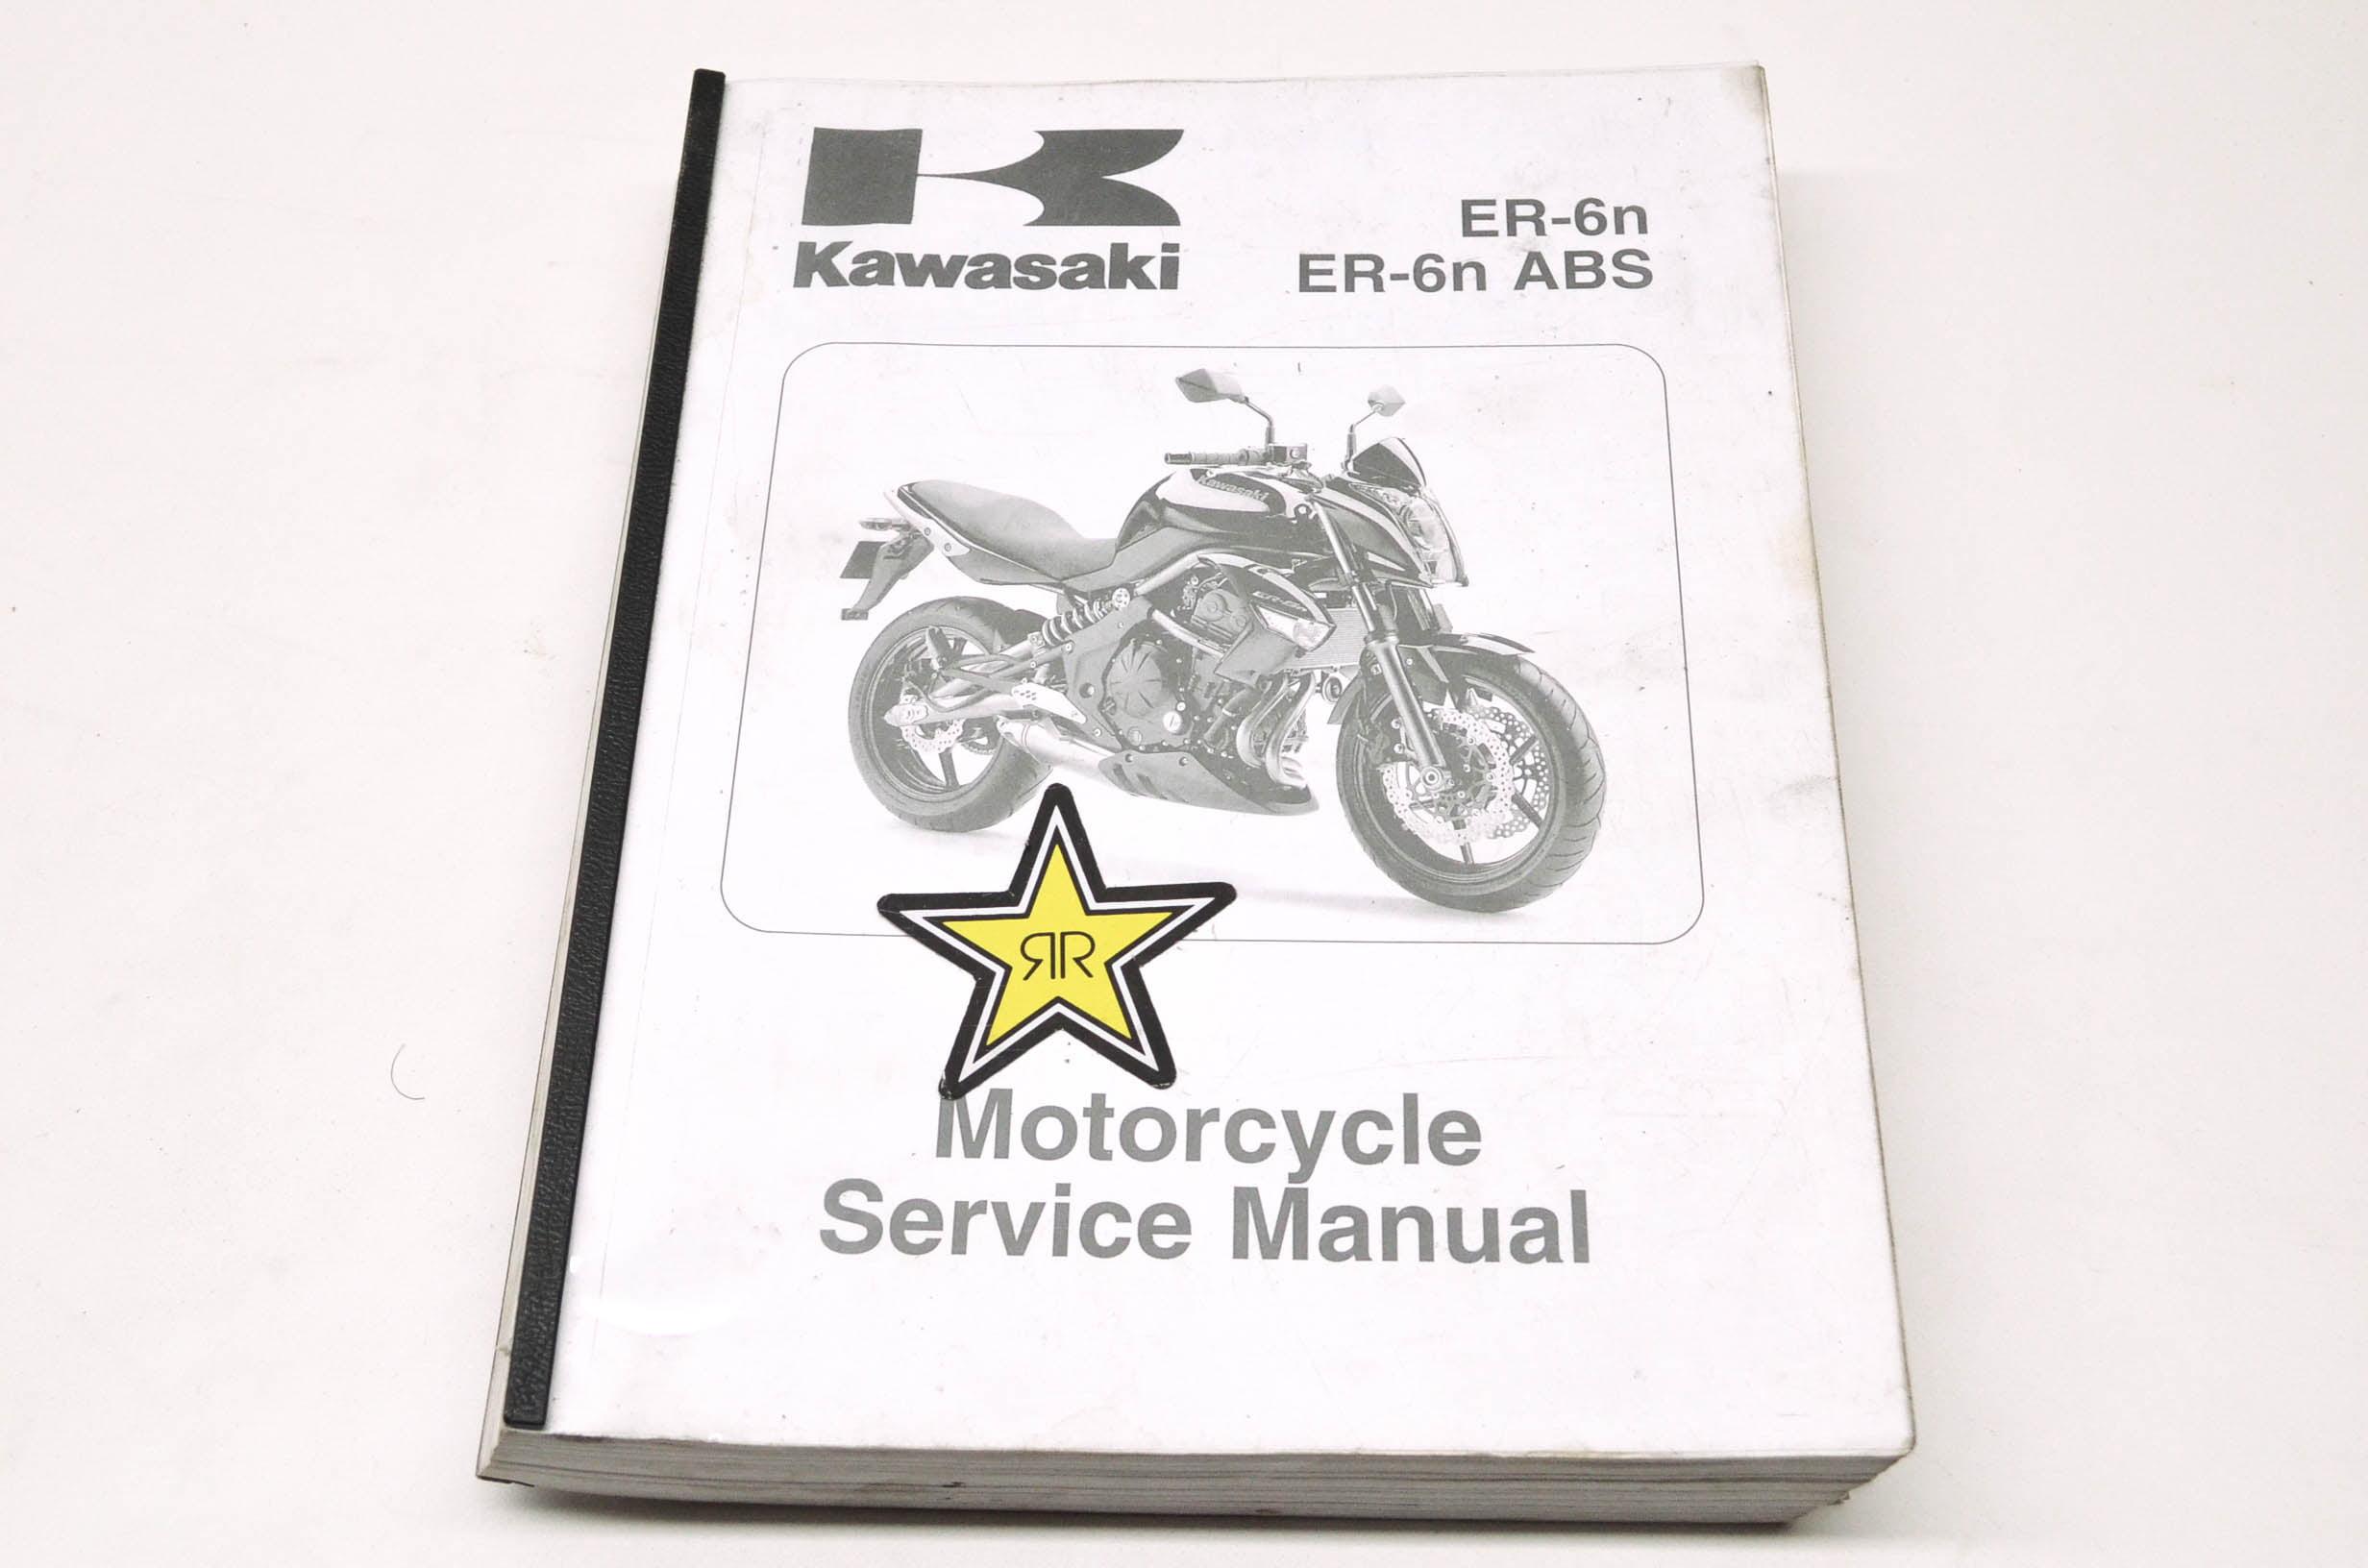 Kawasaki 99924-1418-02 ER-6n, ER-6n ABS Service Manual QTY 1 - Walmart.com